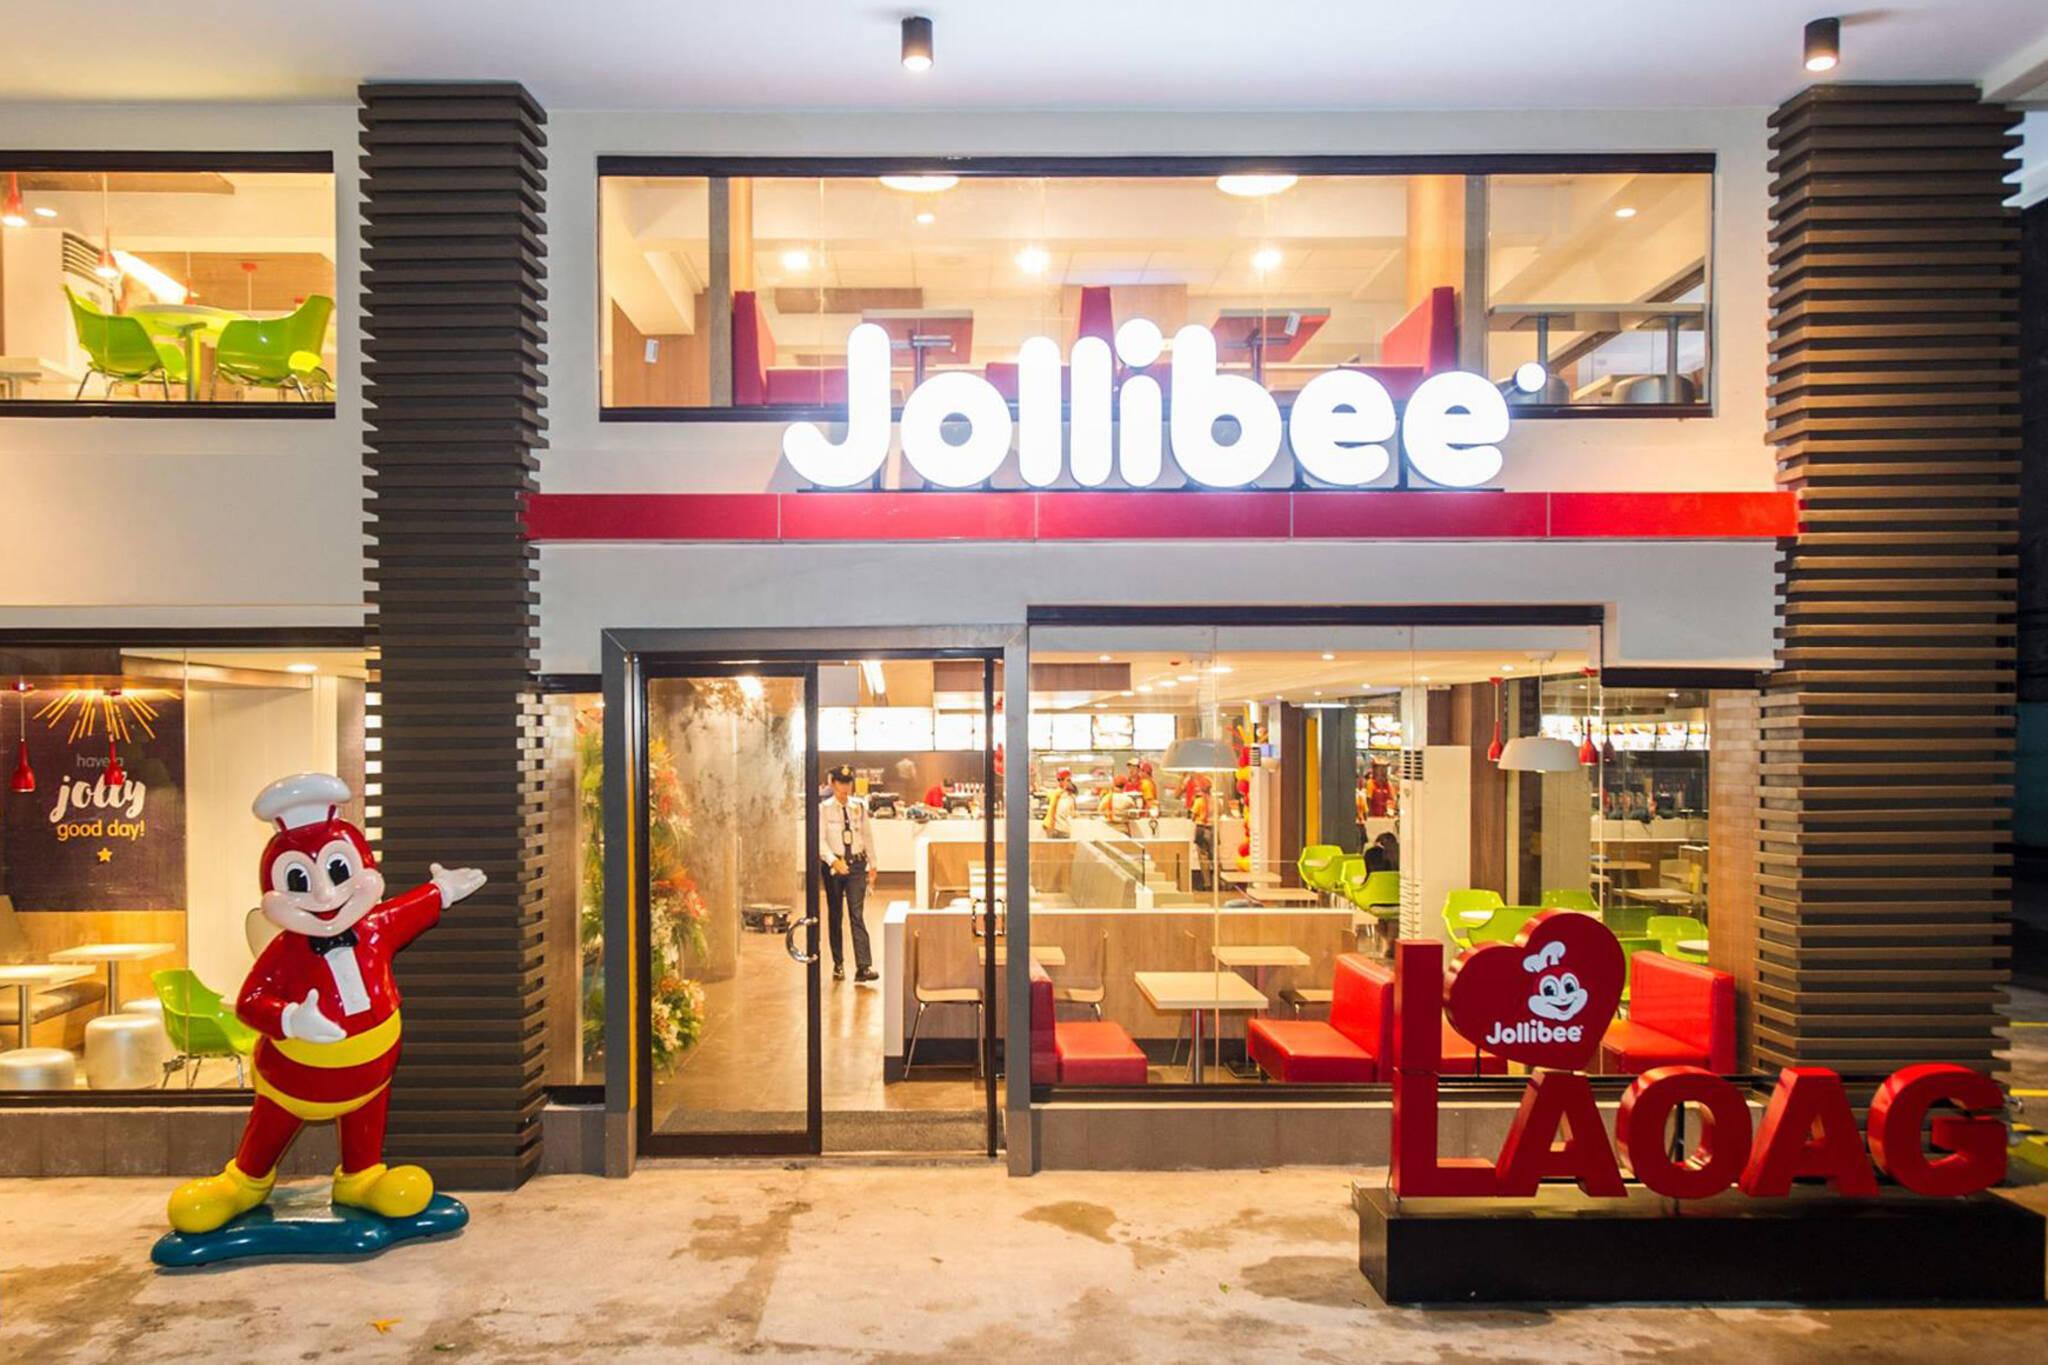 jollibee toronto